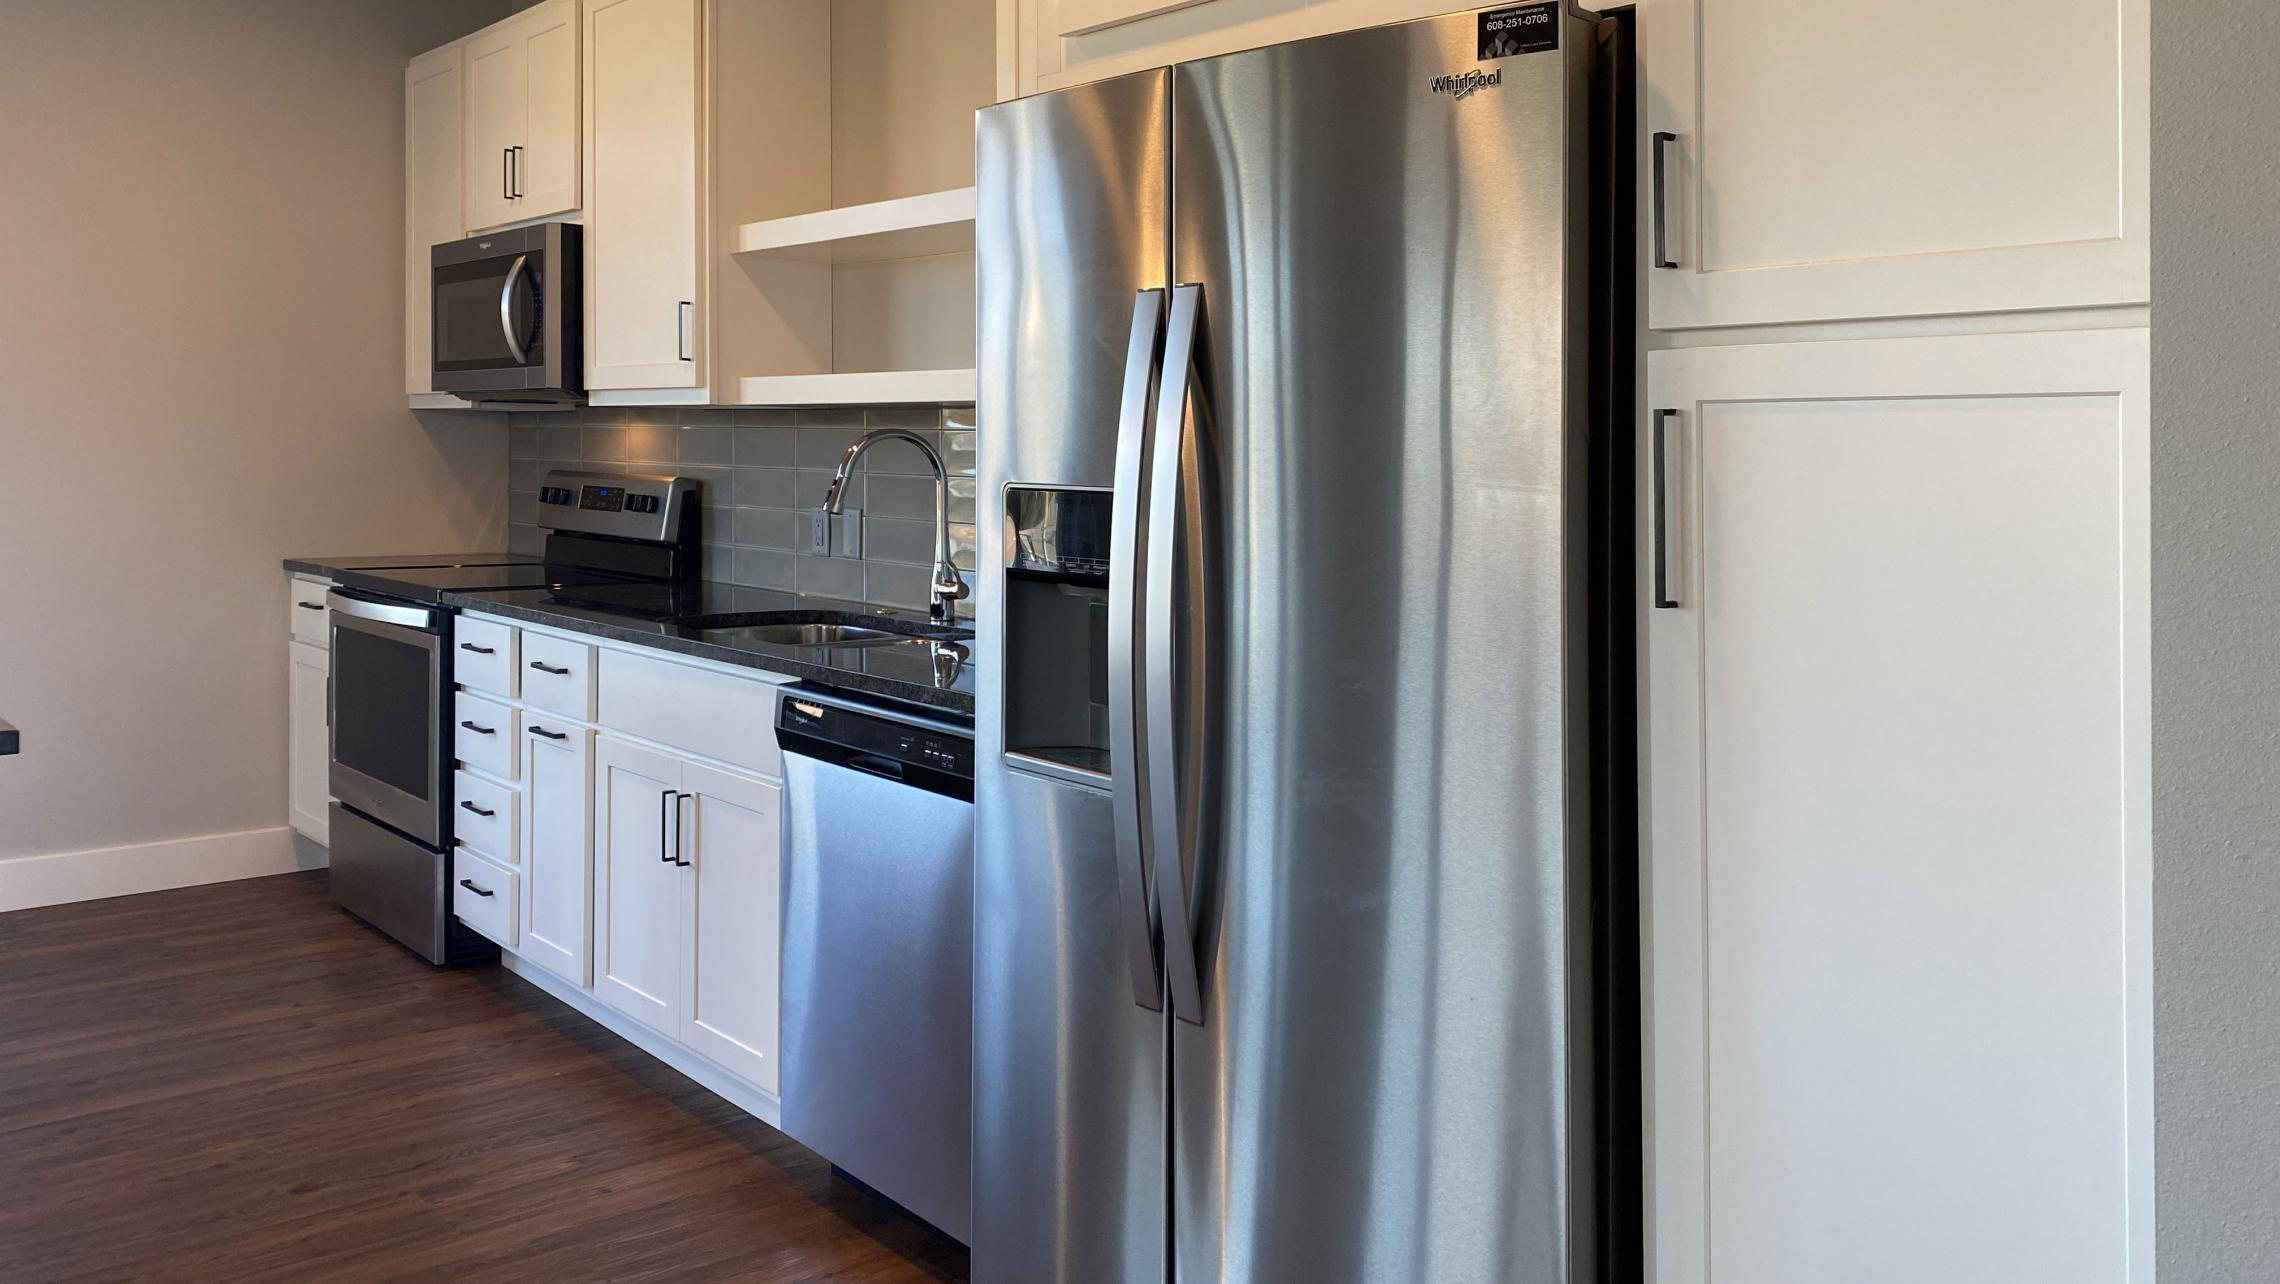 1722-Monroe-Apartments-320-Three-Bedroom-Modern-Upscale-Design-Windows-Natural-Light-Balcony-Gym-Terrace-Living-Luxury-Lounge-Madison-Views-Kitchen